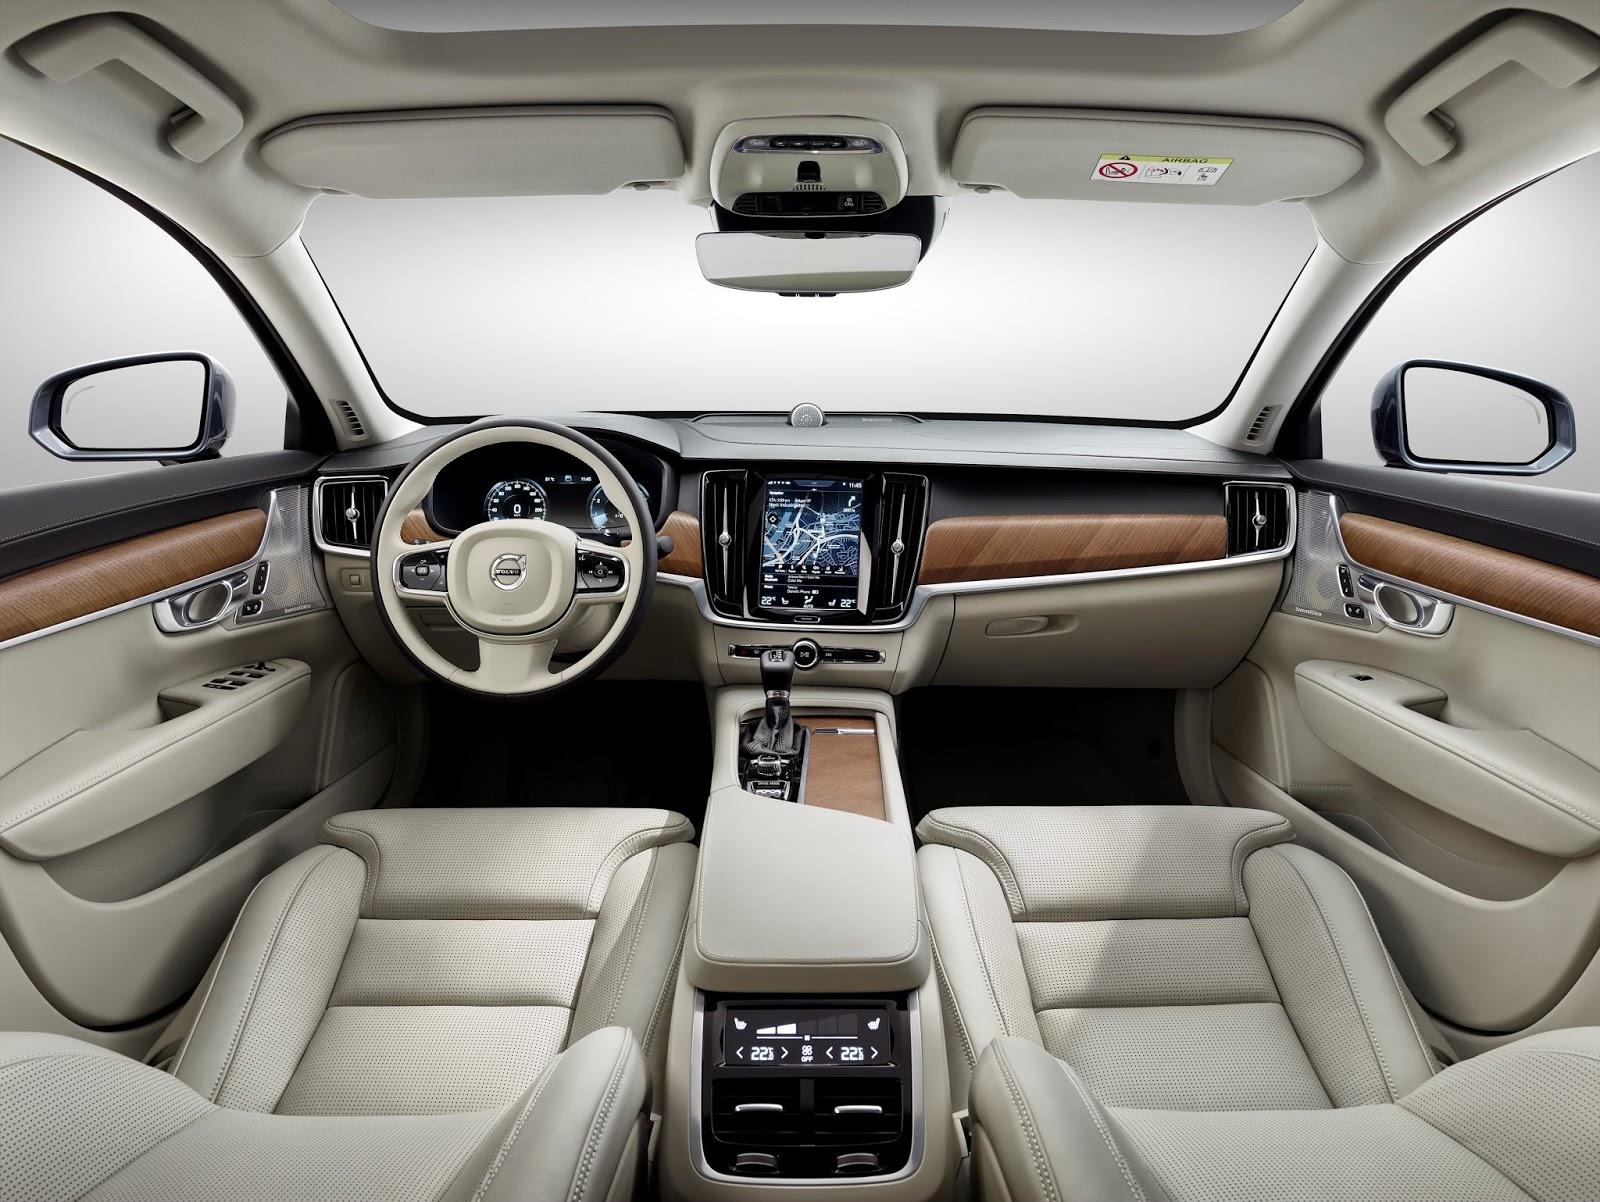 170101 Interior Blond Volvo S90 Το νέο Volvo S90 έρχεται και βάζει φωτιά στον ανταγωνισμό premium sedan, Volvo, Volvo Cars, Volvo S90